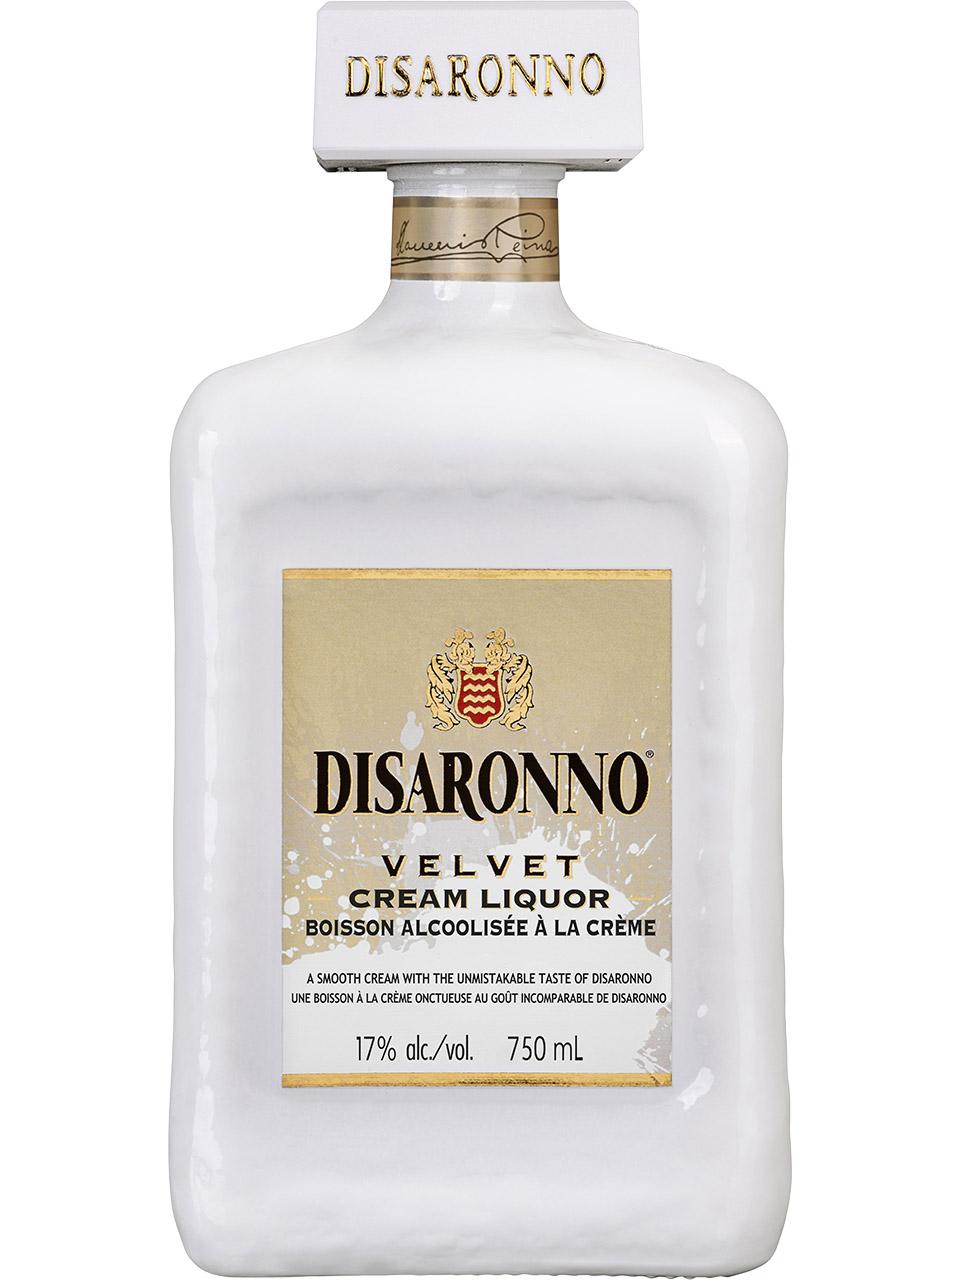 Disaronno Velvet Liqueur